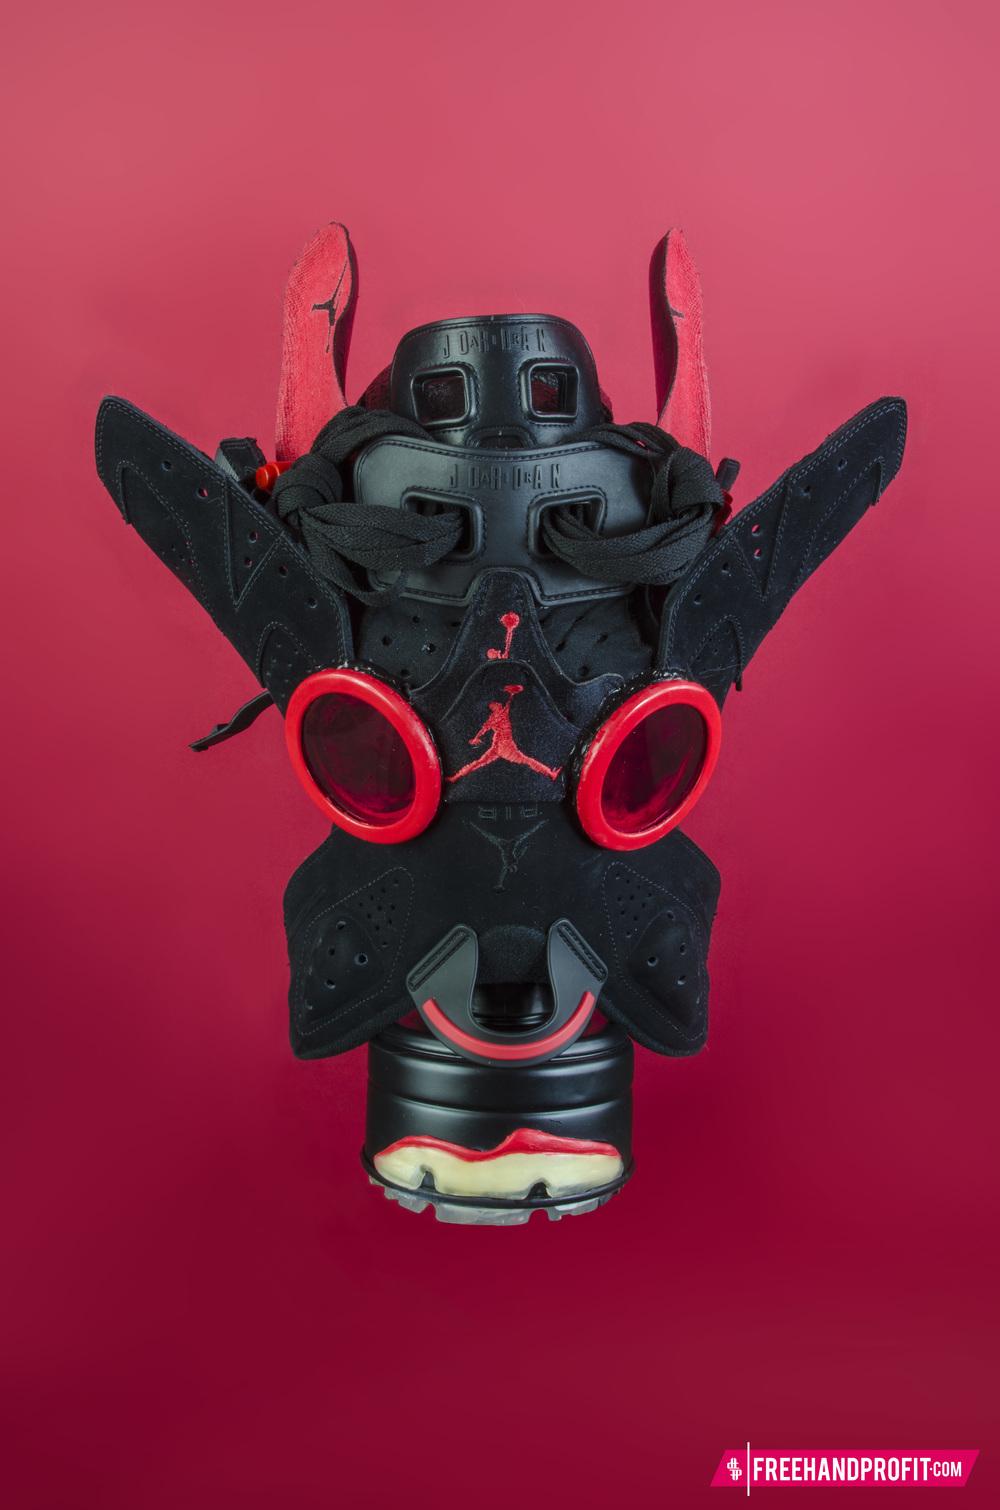 separation shoes e46eb 5c6ad ... order 047 jordan black infrared 6 gas mask 08 bdc90 c15c5